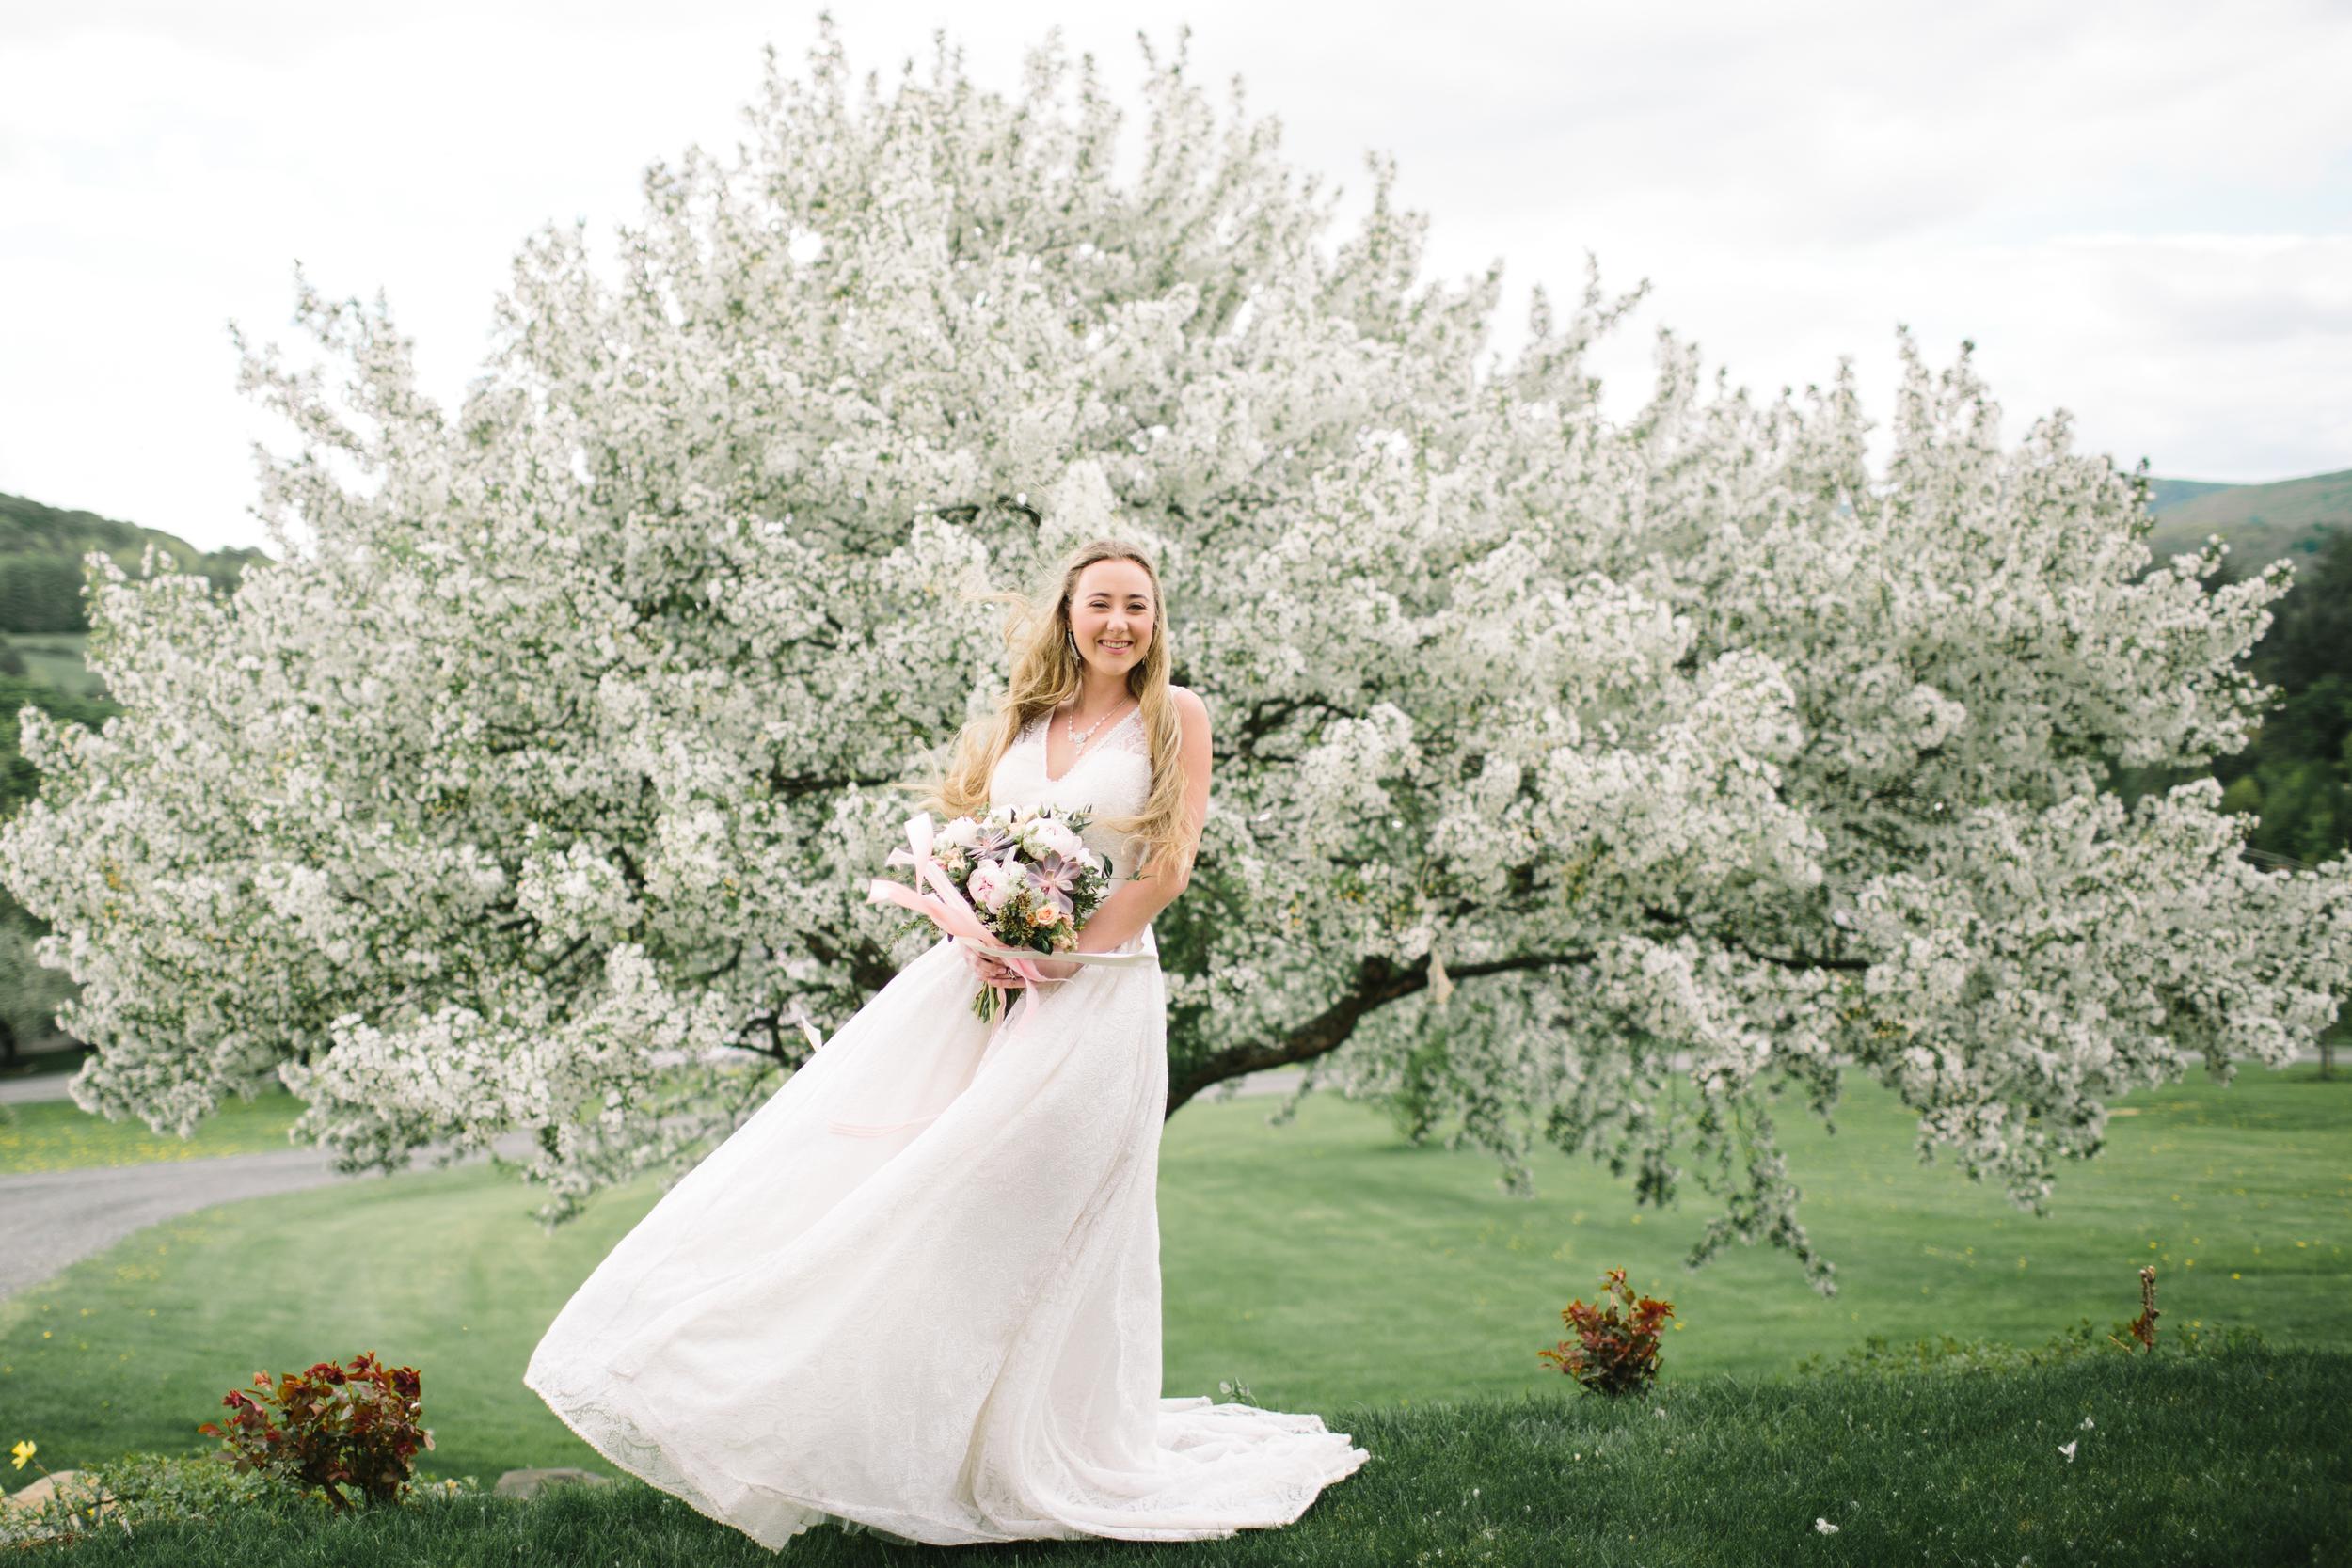 Vermont Bridal Accessory Designer   Blush Pink and Peach Wedding Inspiration